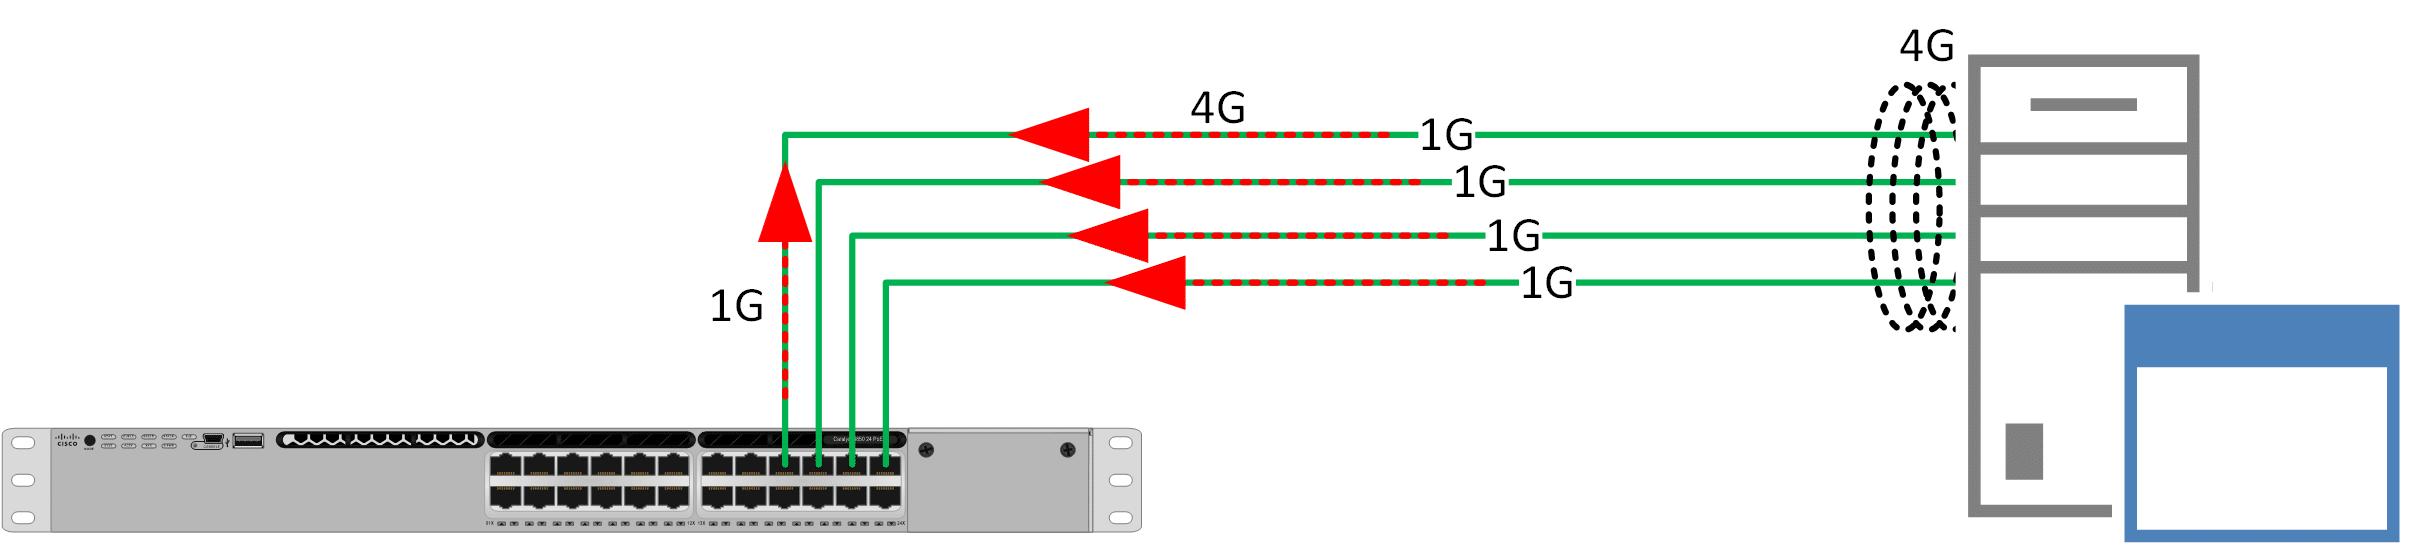 Link Aggregation - LACP Protocol